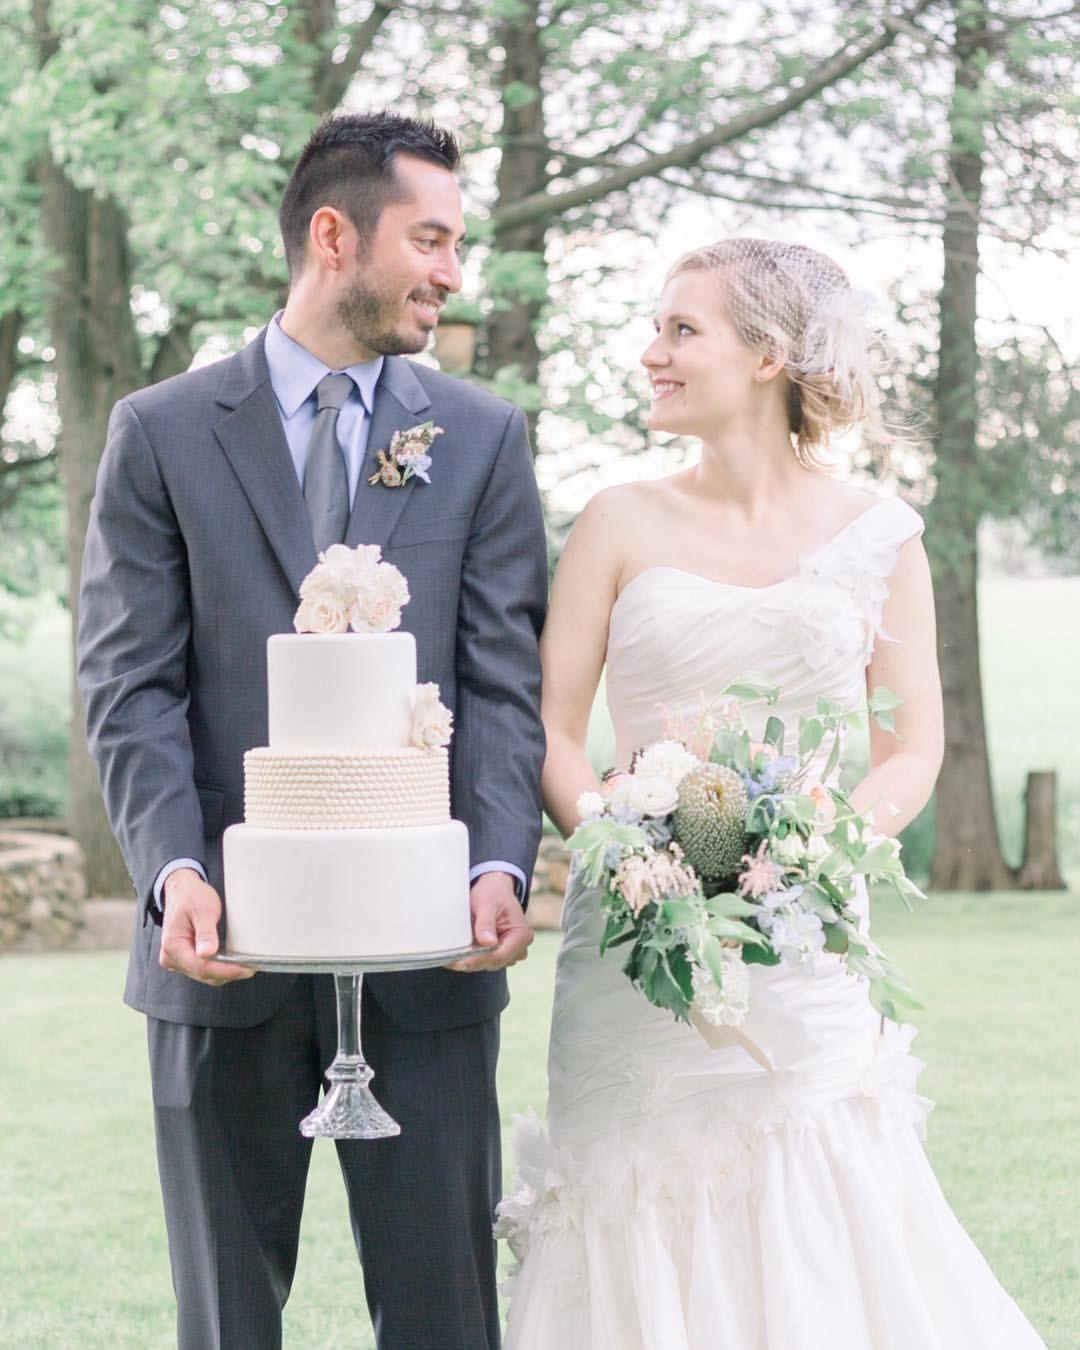 romantic farm wedding styled shoot in whitelaw, wisconsin